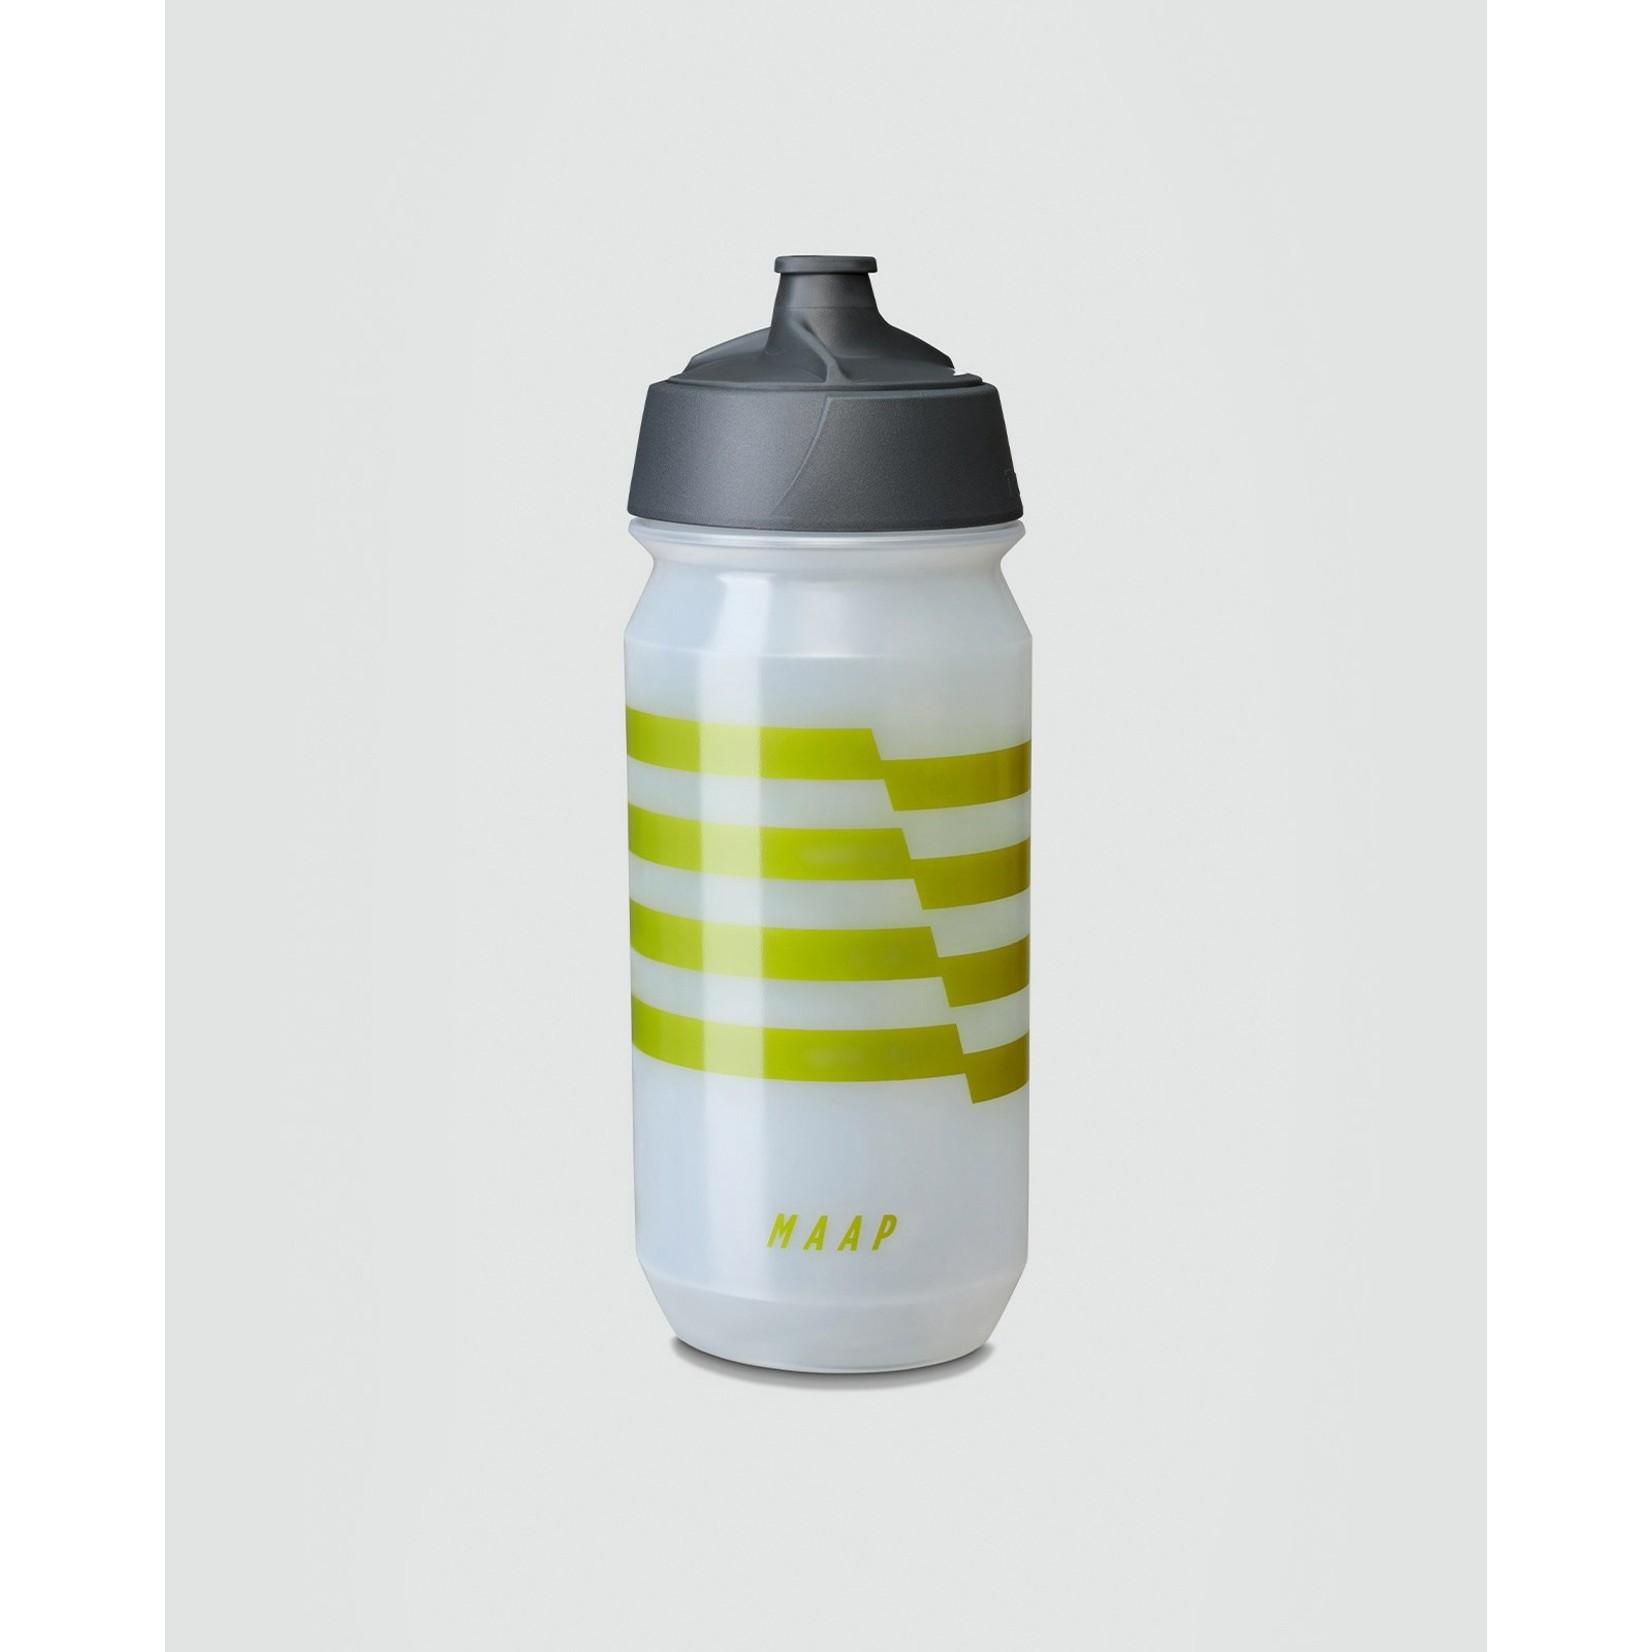 MAAP Emblem Bottle - Transparent / Fern